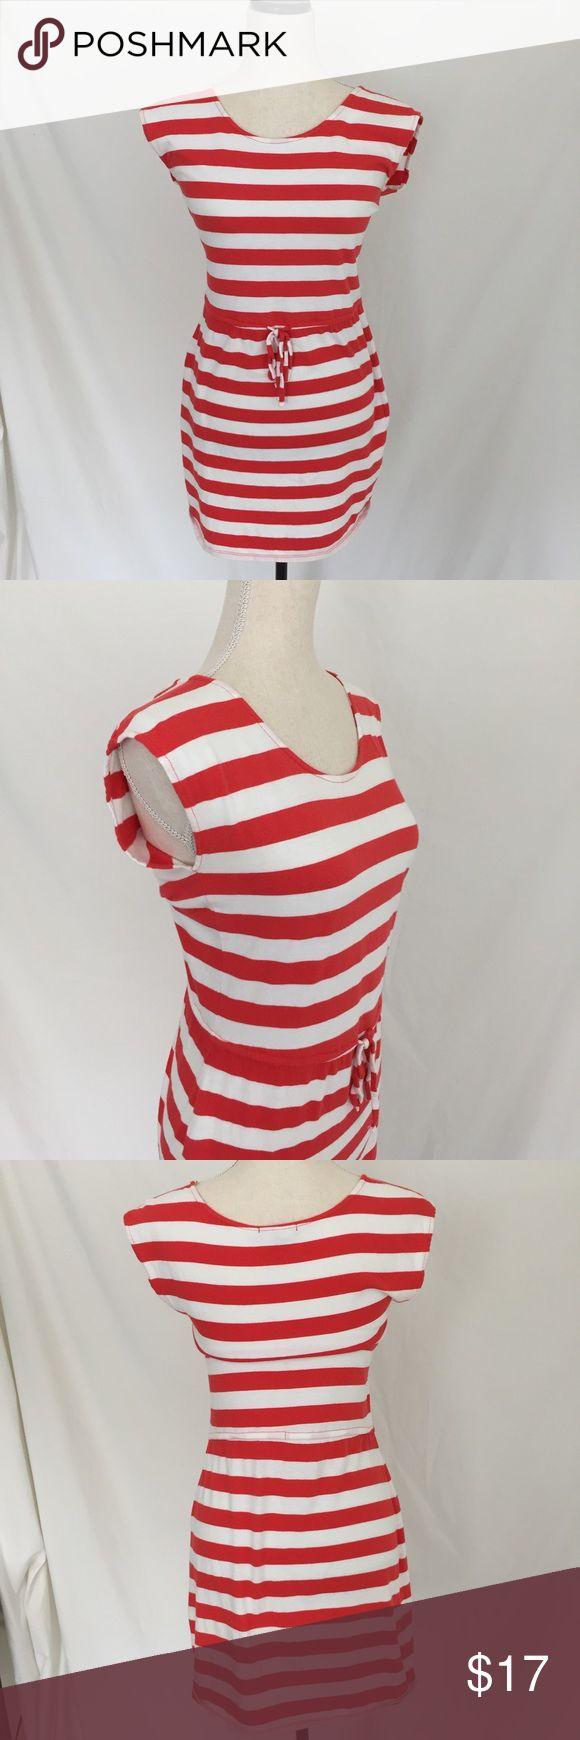 Gap Dress XS Sleeveless Orange Stripes Drawstring waist, scoop neck, knee length, orange & white striped, cotton blend; P114 Gap Dresses